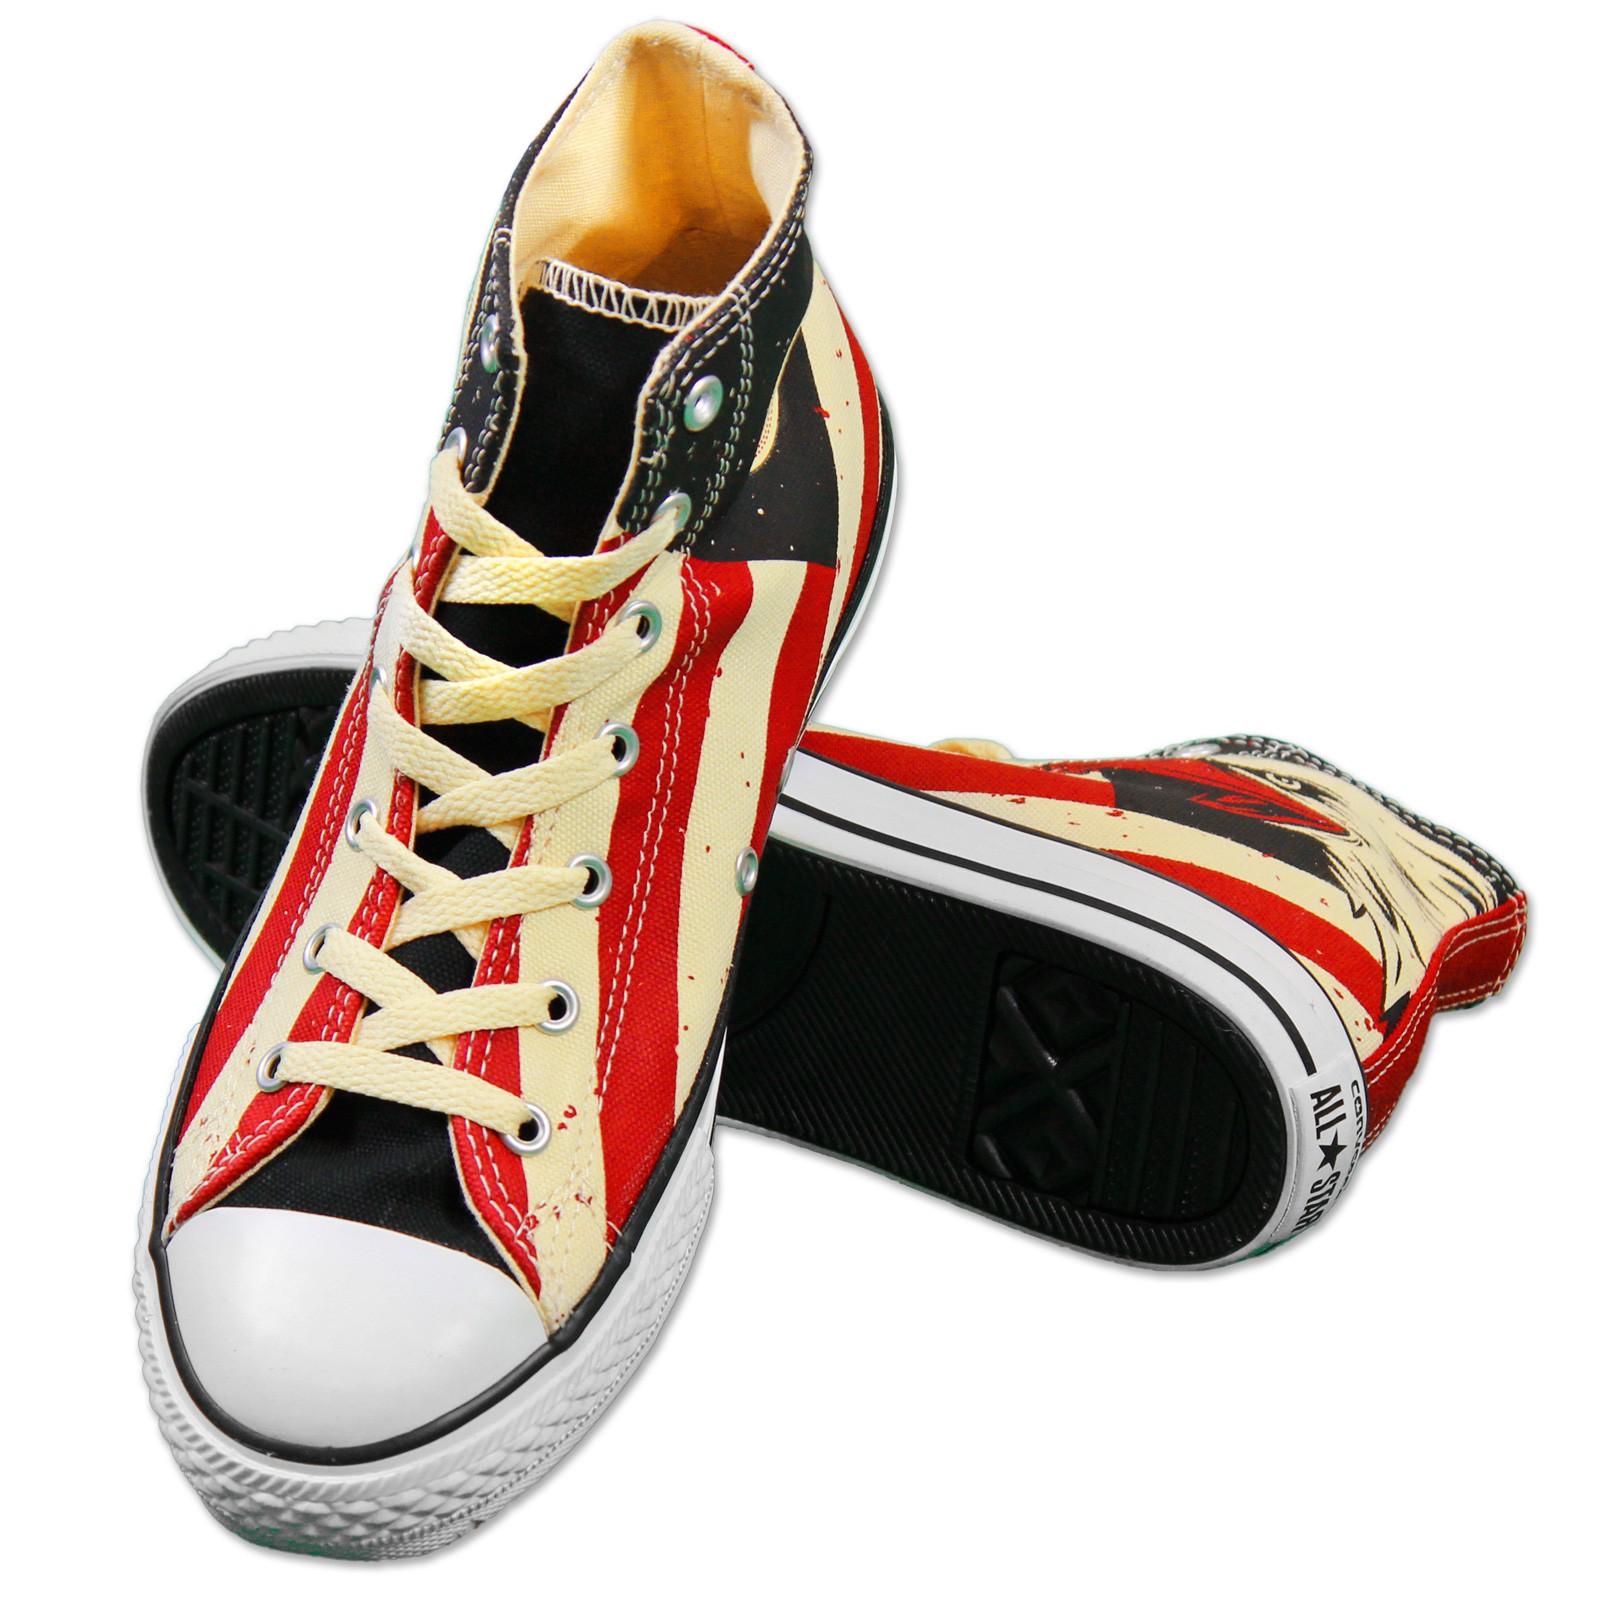 Details about Converse all Star Chucks Taylor Hi Soon Eagle USA US Eagle Shoes 645156C